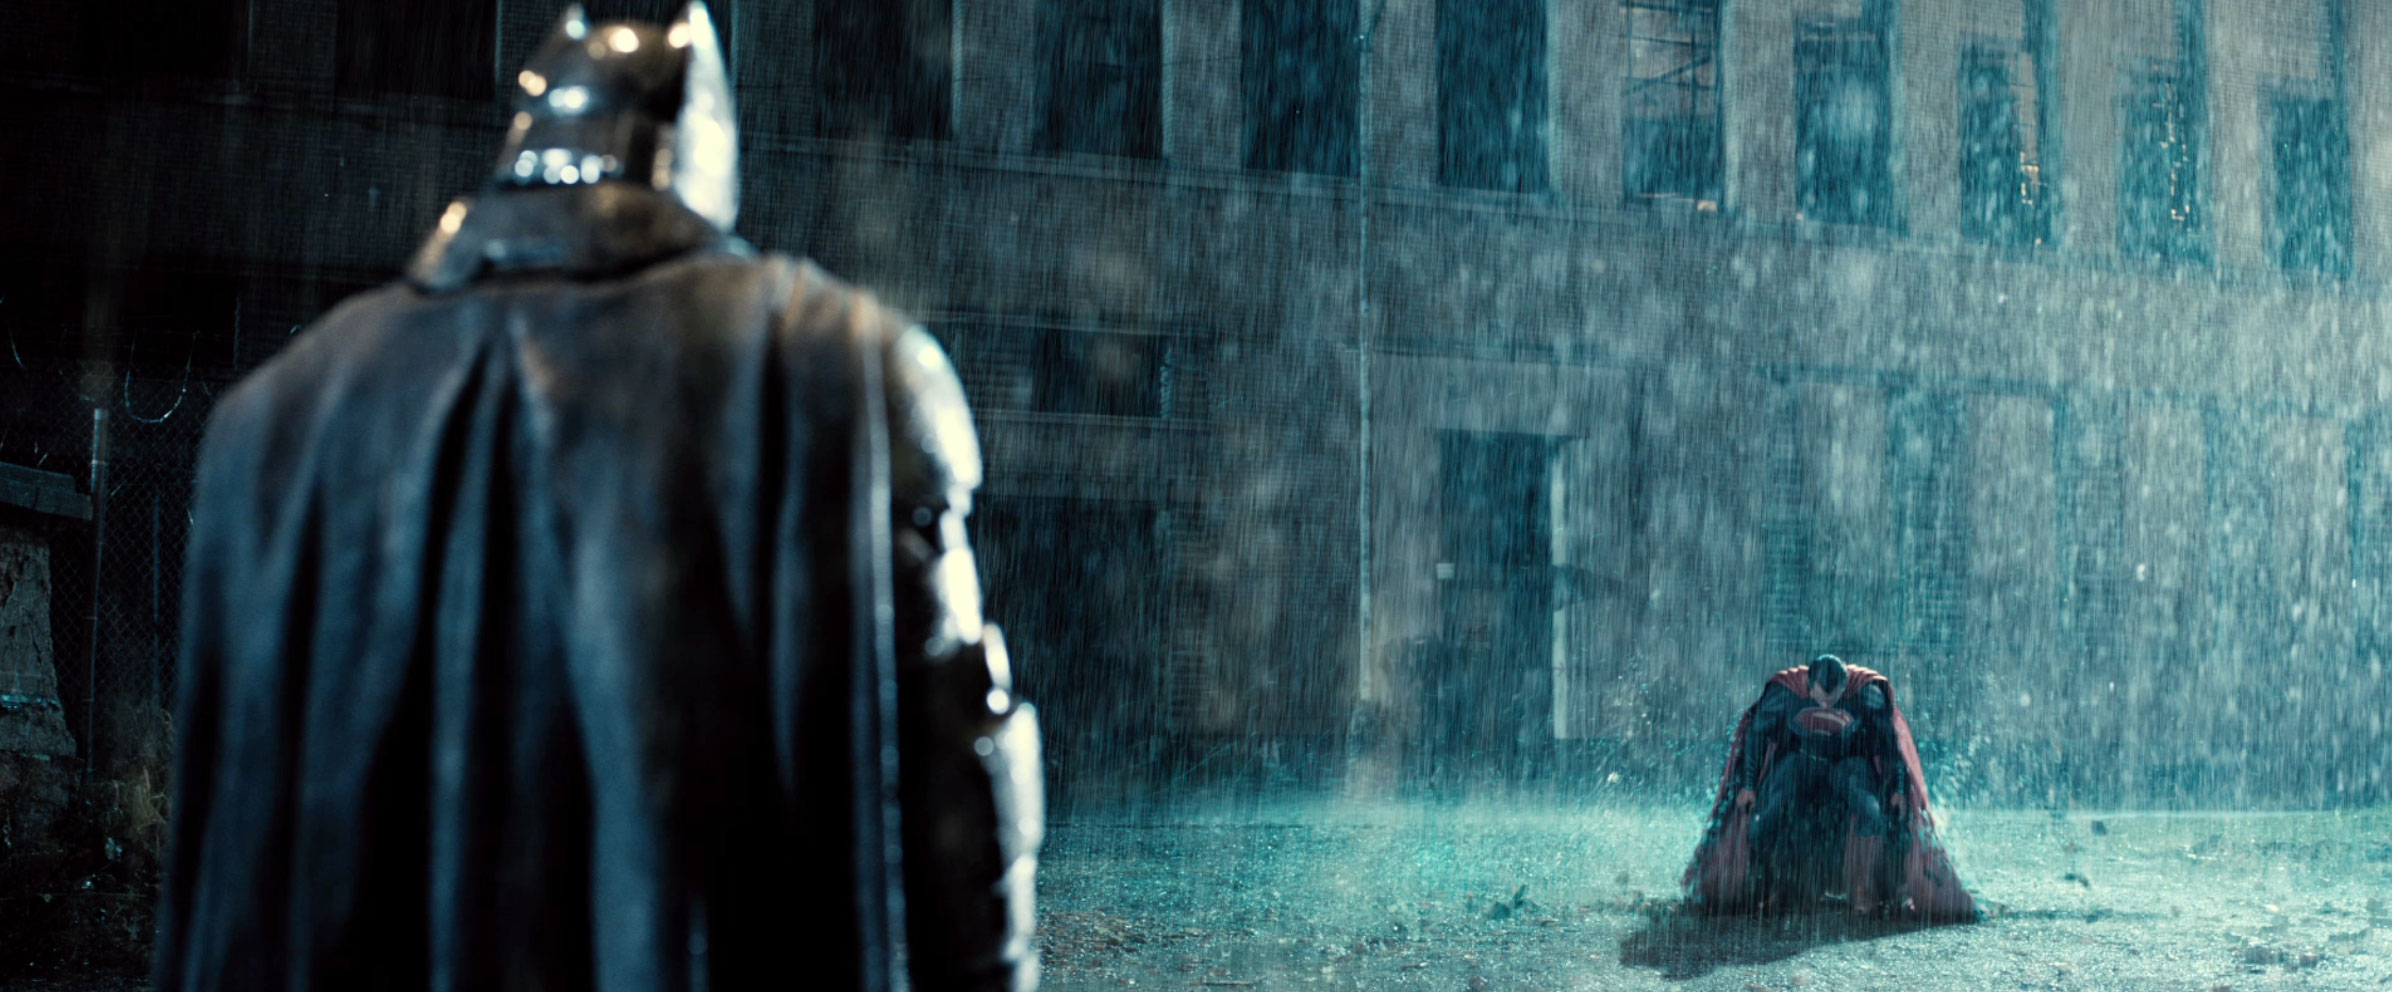 batman-v-superman-trailer-screengrab-34